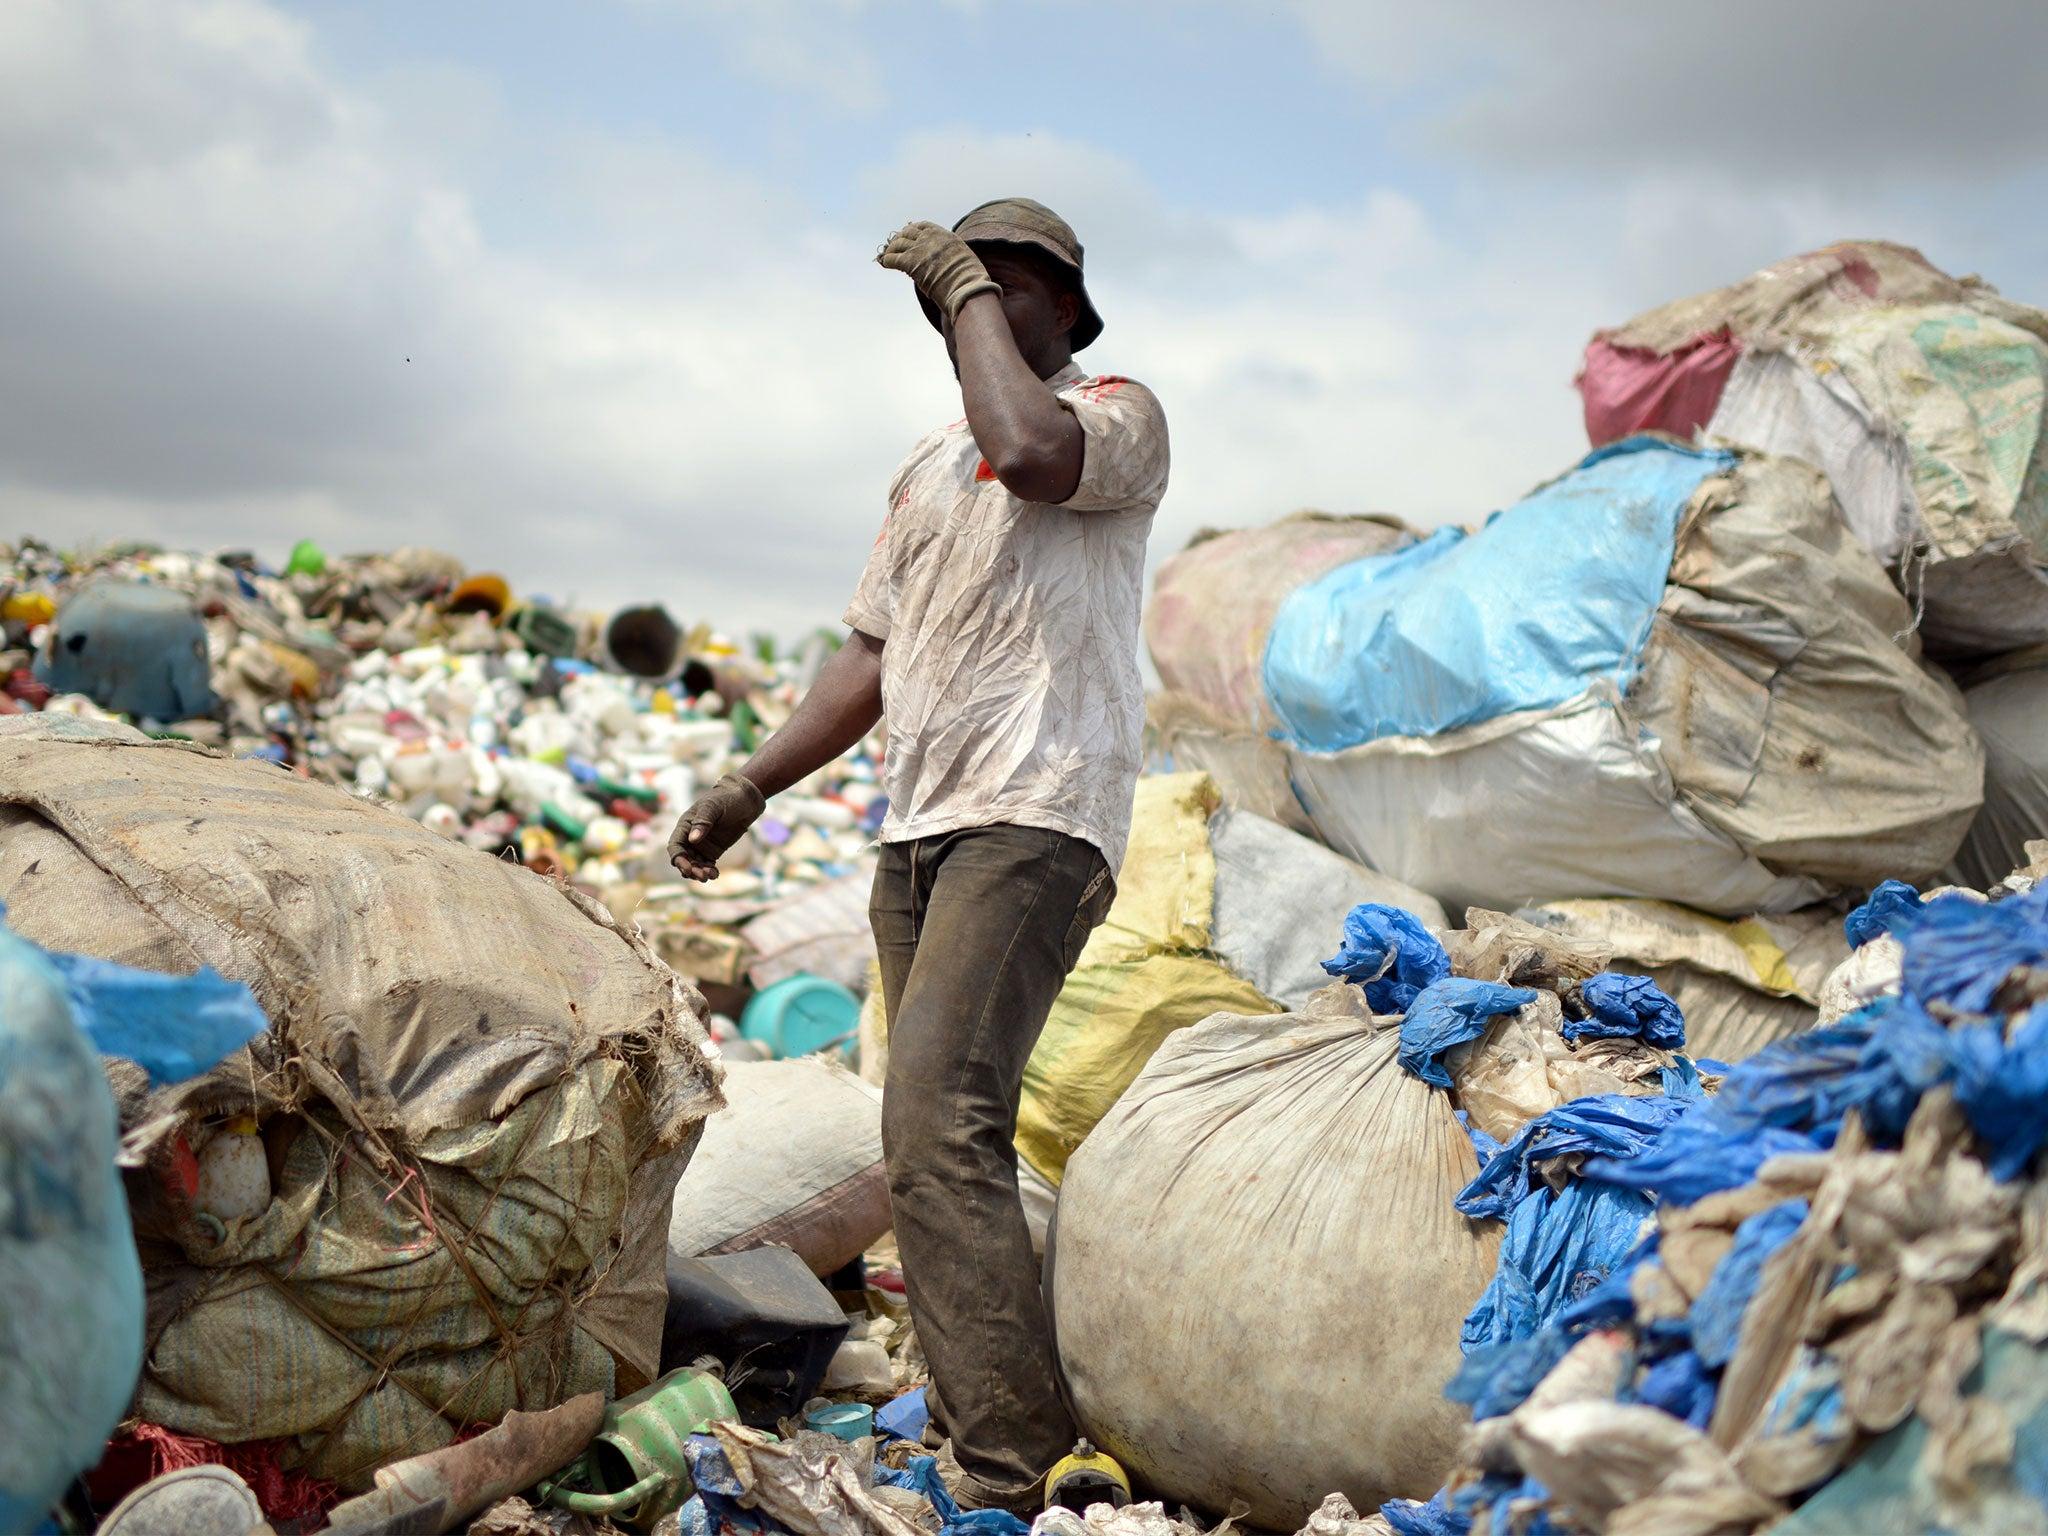 Tanzania to ban plastic bags in bid to tackle pollution